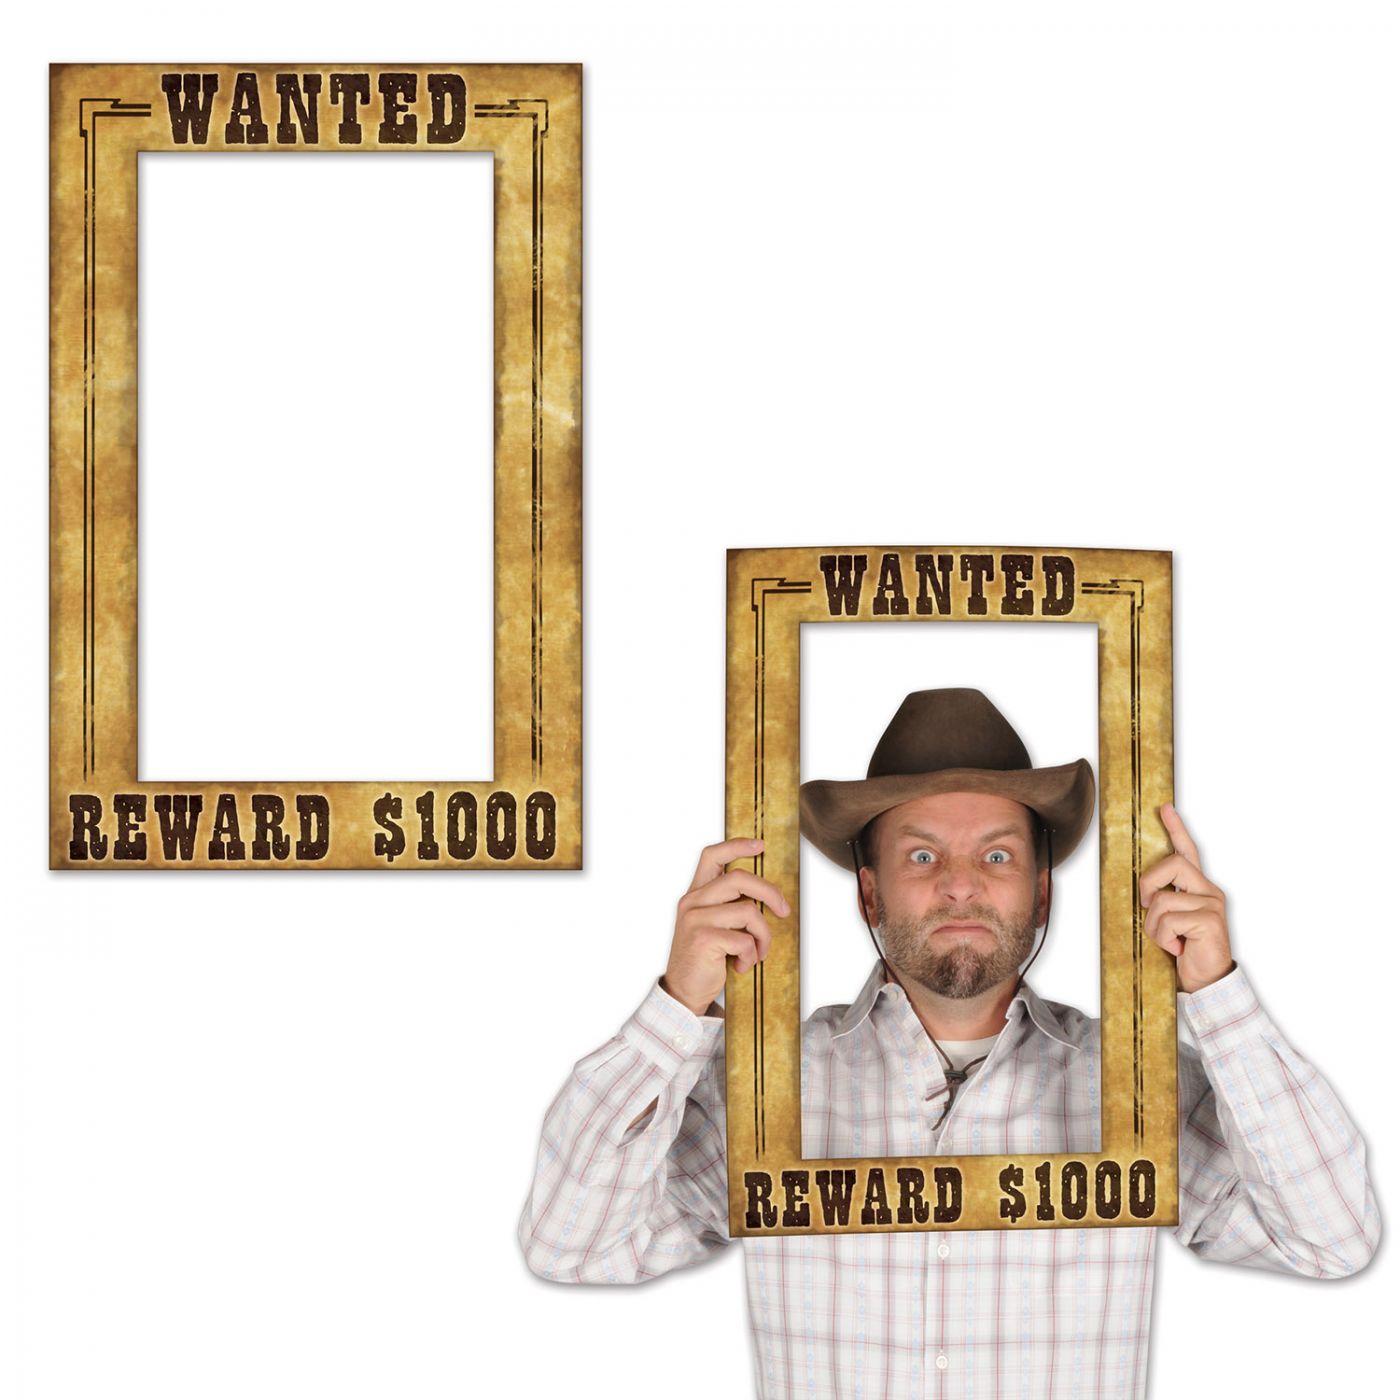 Western Wanted Photo Fun Frame image